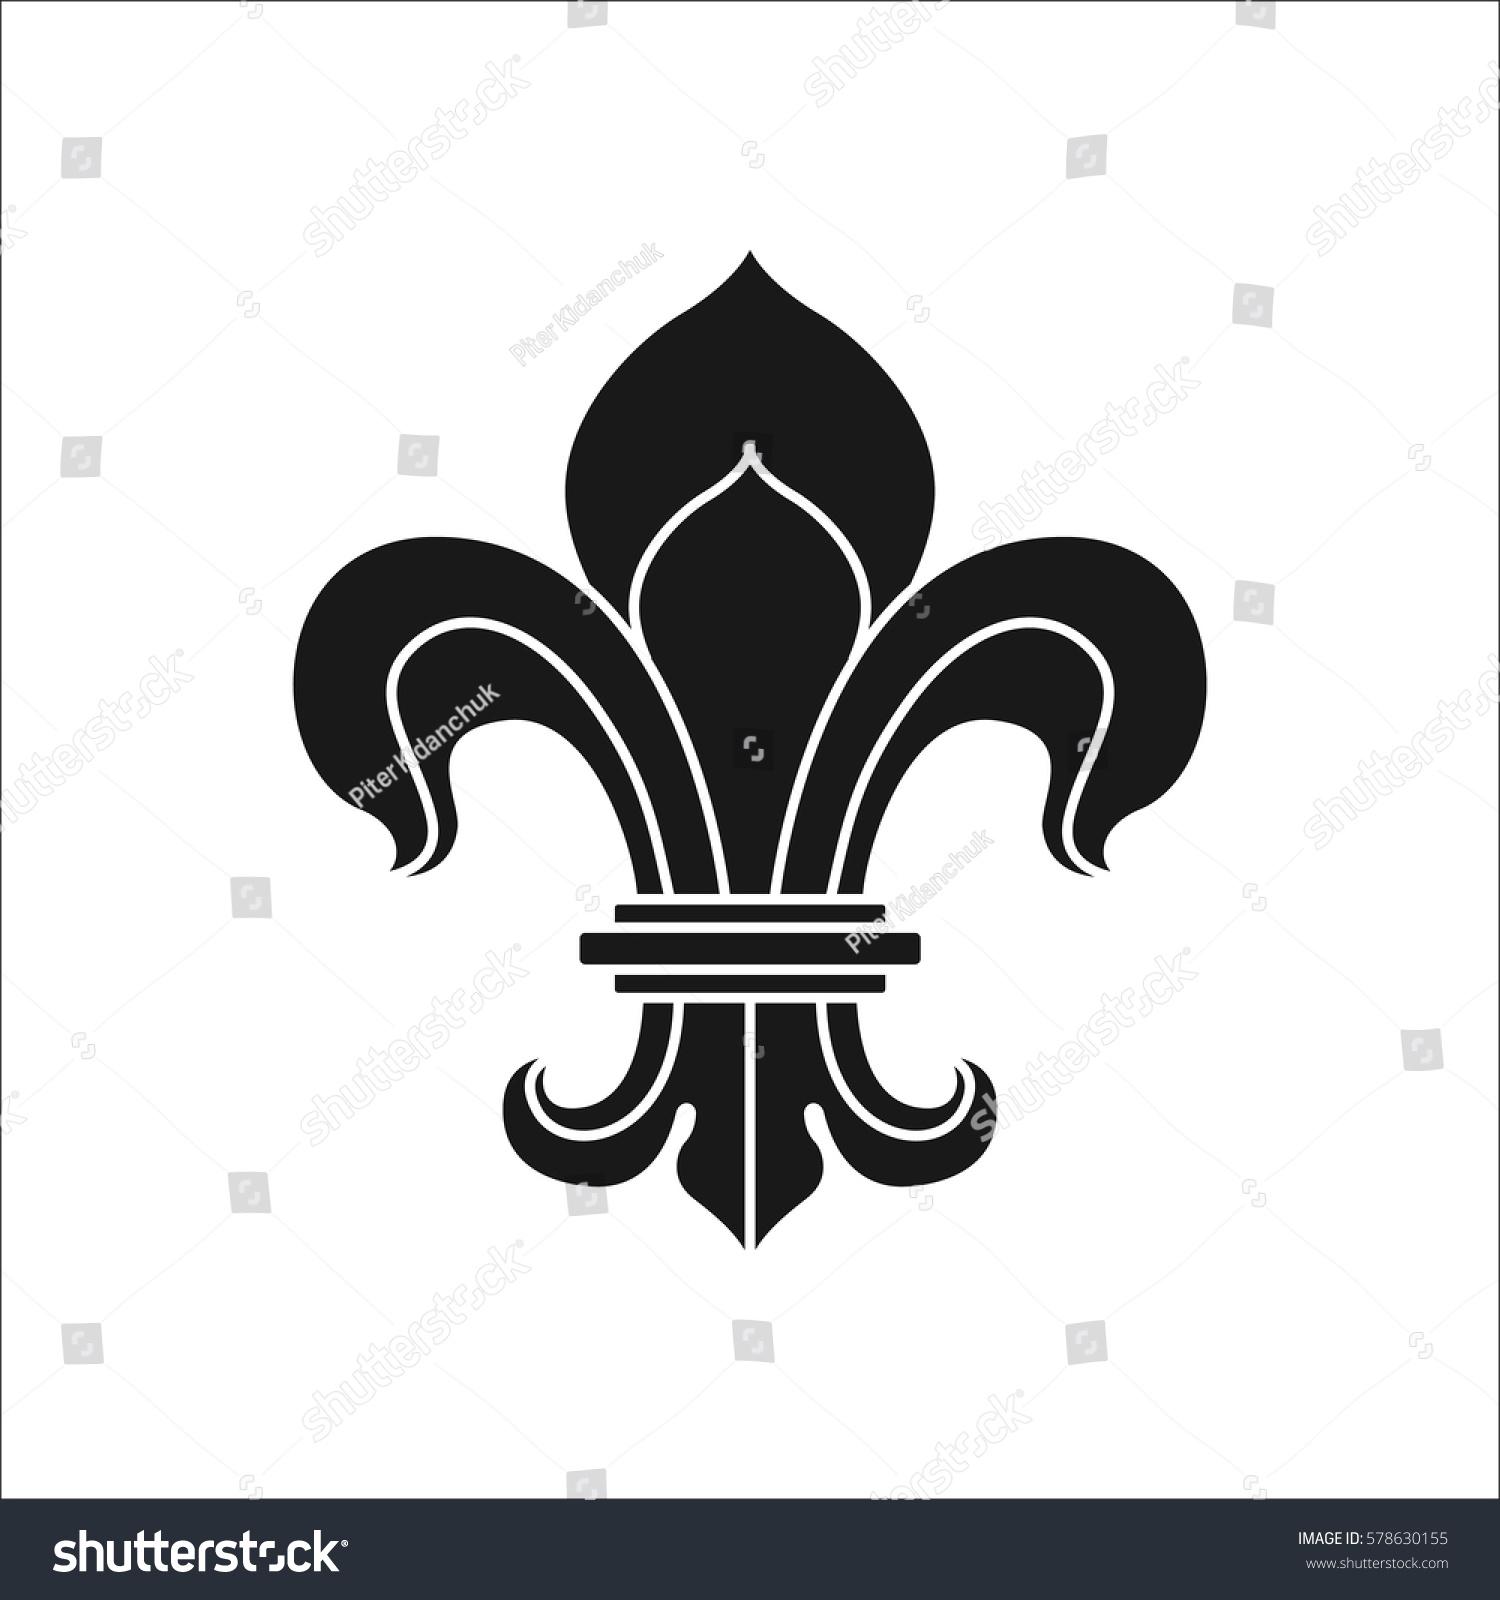 Royal lily fleur de lis symbol stock vector 578630155 shutterstock royal lily or fleur de lis symbol simple silhouette icon on background biocorpaavc